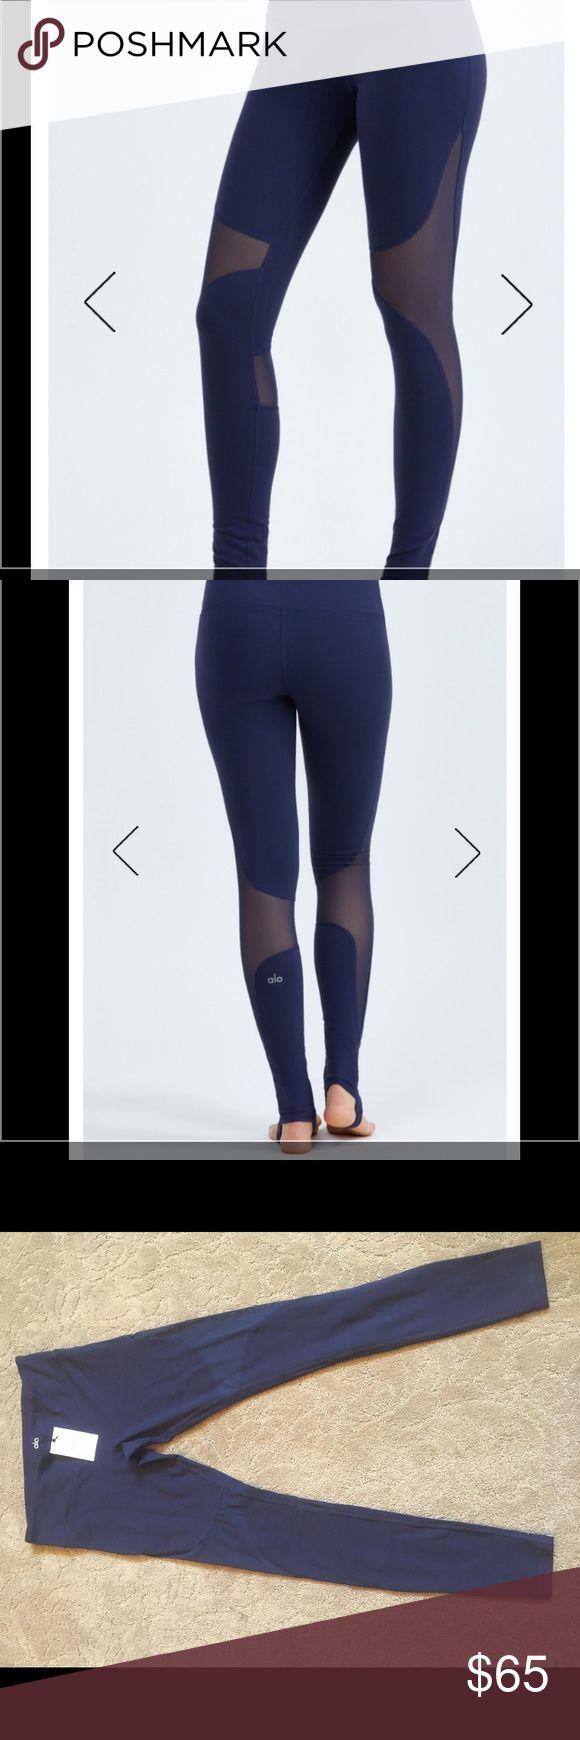 Alo yoga coast leggings rich Navy Sz L NWT Alo yoga coast leggings with mesh cutouts. Size large. Navy. New with tags. ALO Yoga Pants Leggings